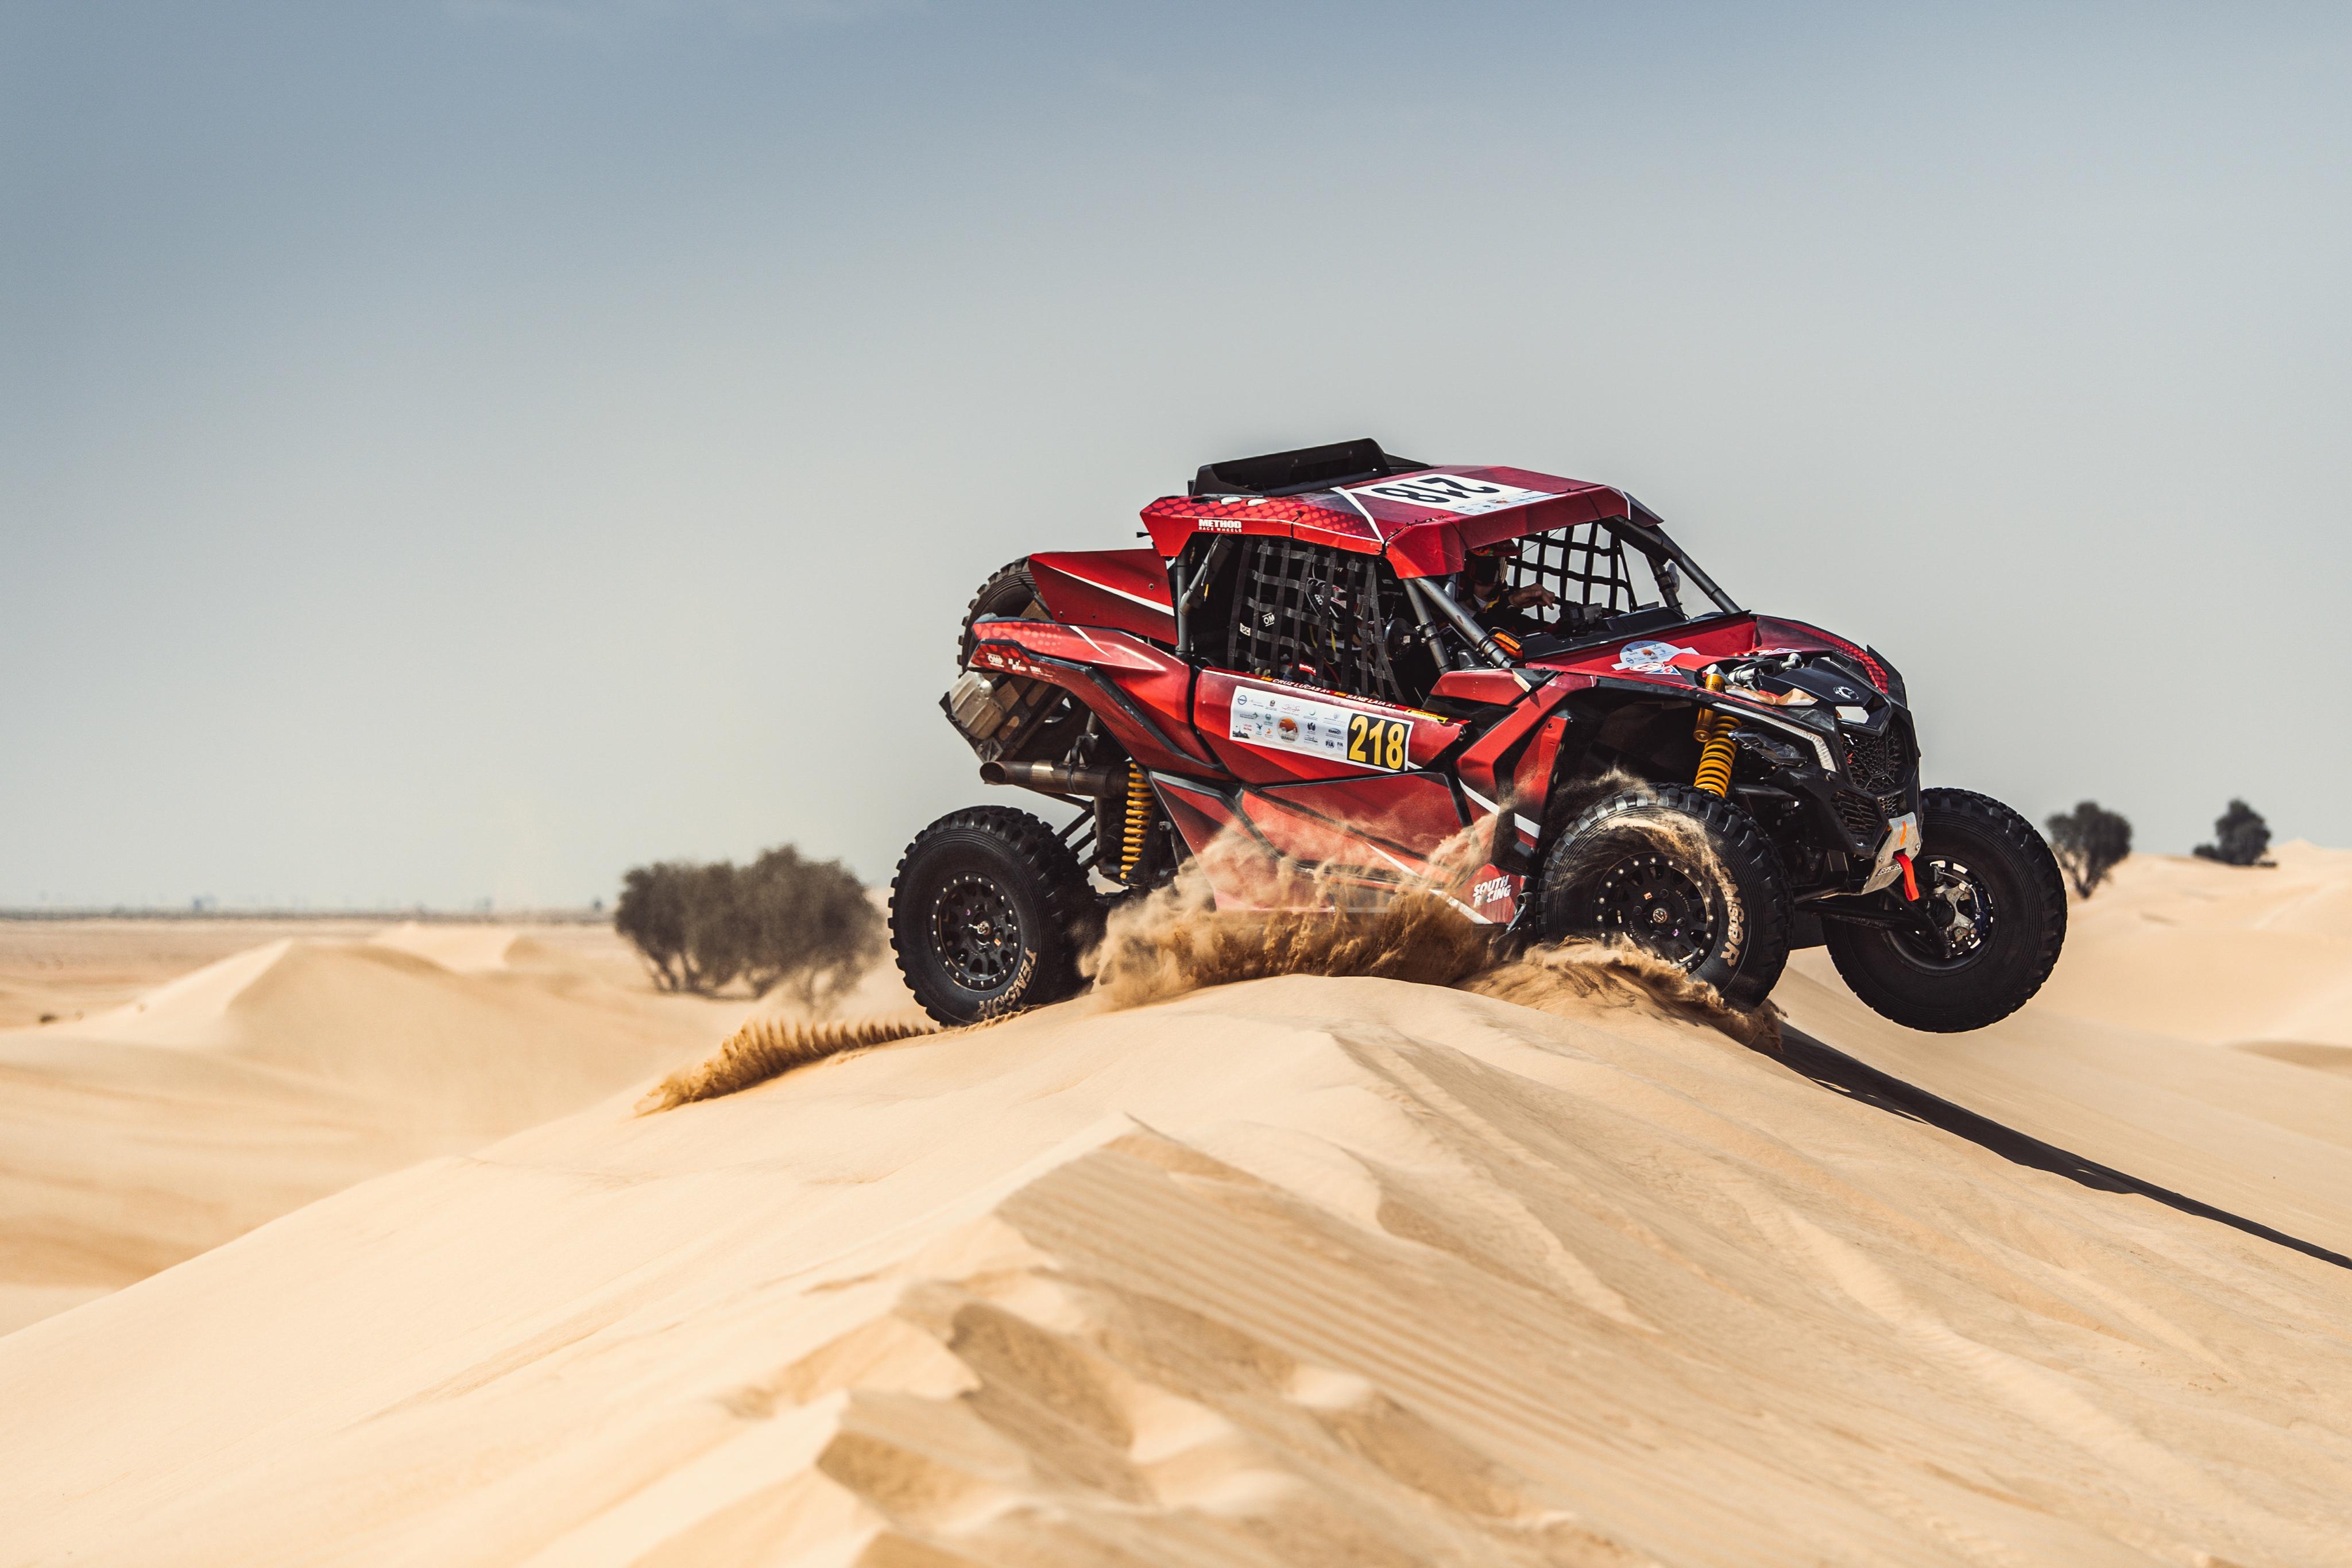 2021 43º Rallye Raid Dakar - Arabia Saudí [3-15 Enero] - Página 15 EusJkY1WQAM8zgL?format=jpg&name=4096x4096